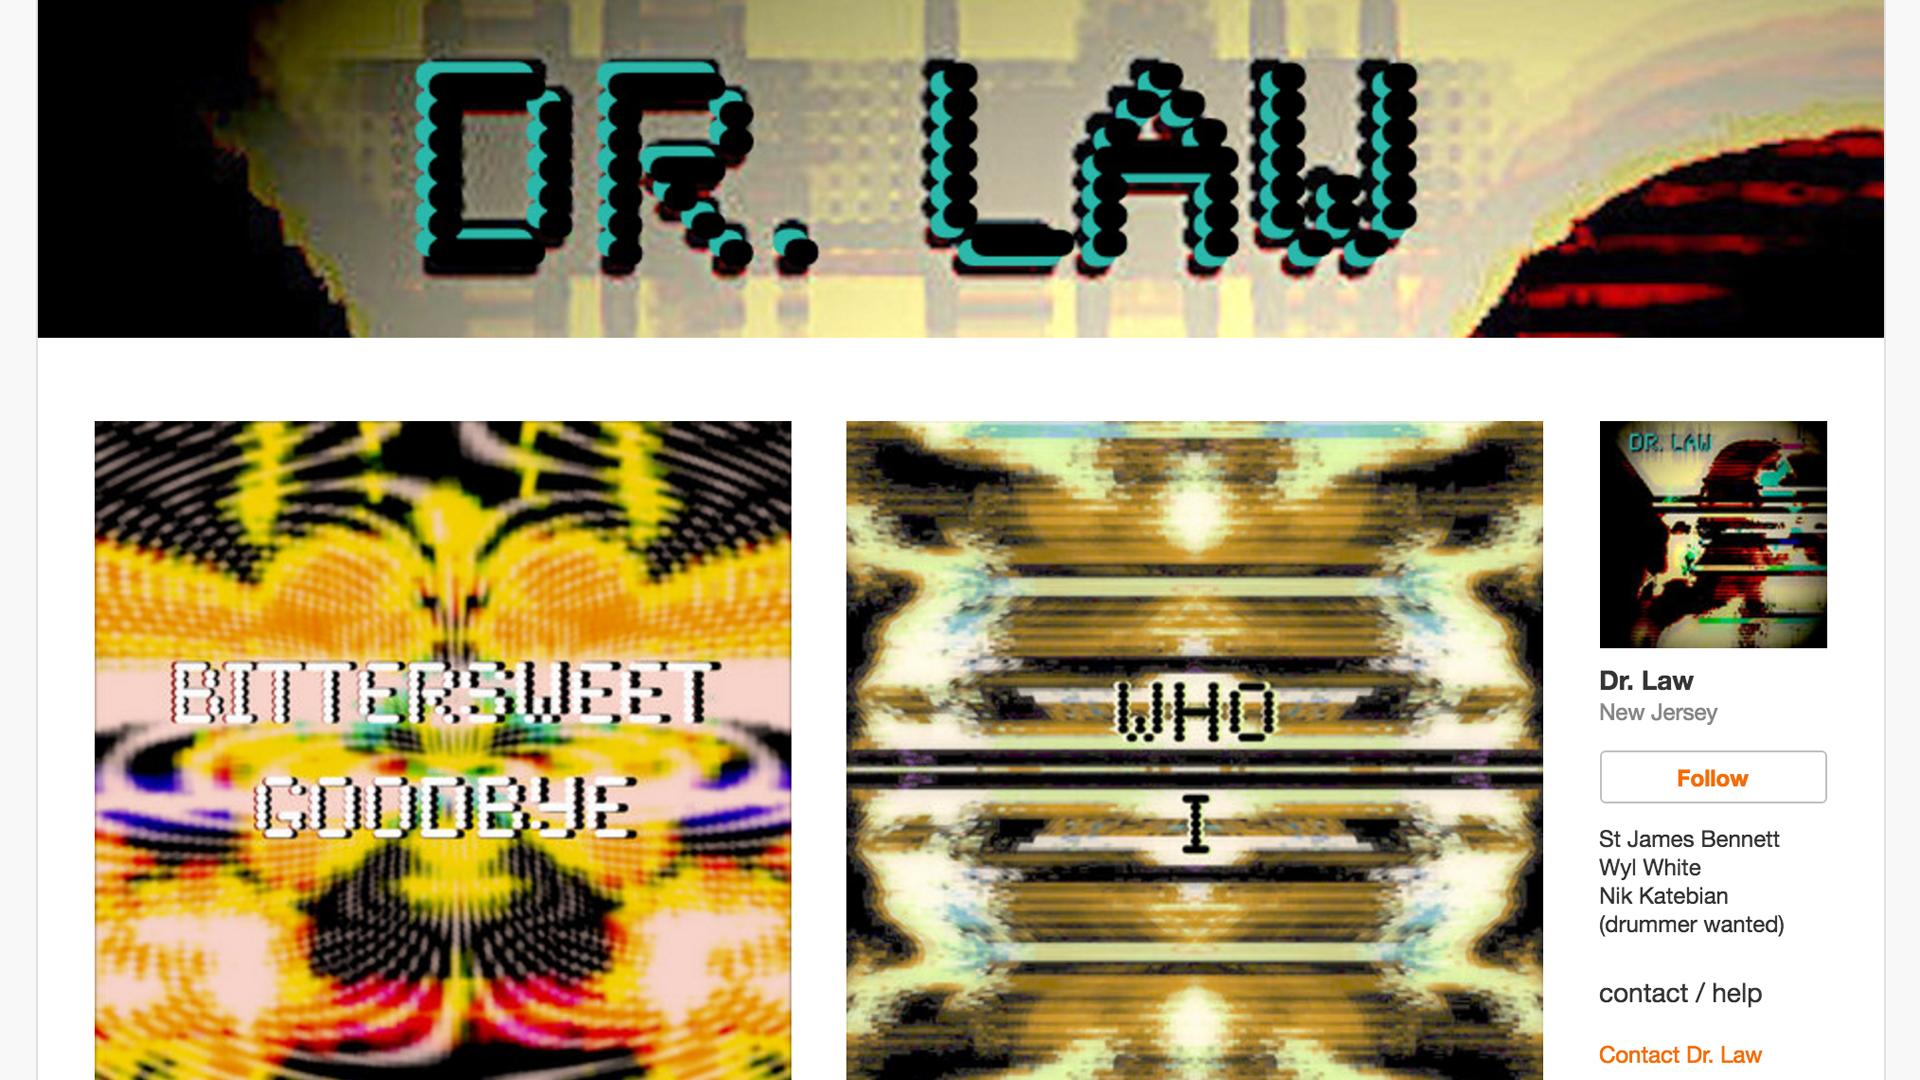 drlaw.bandcamp.com